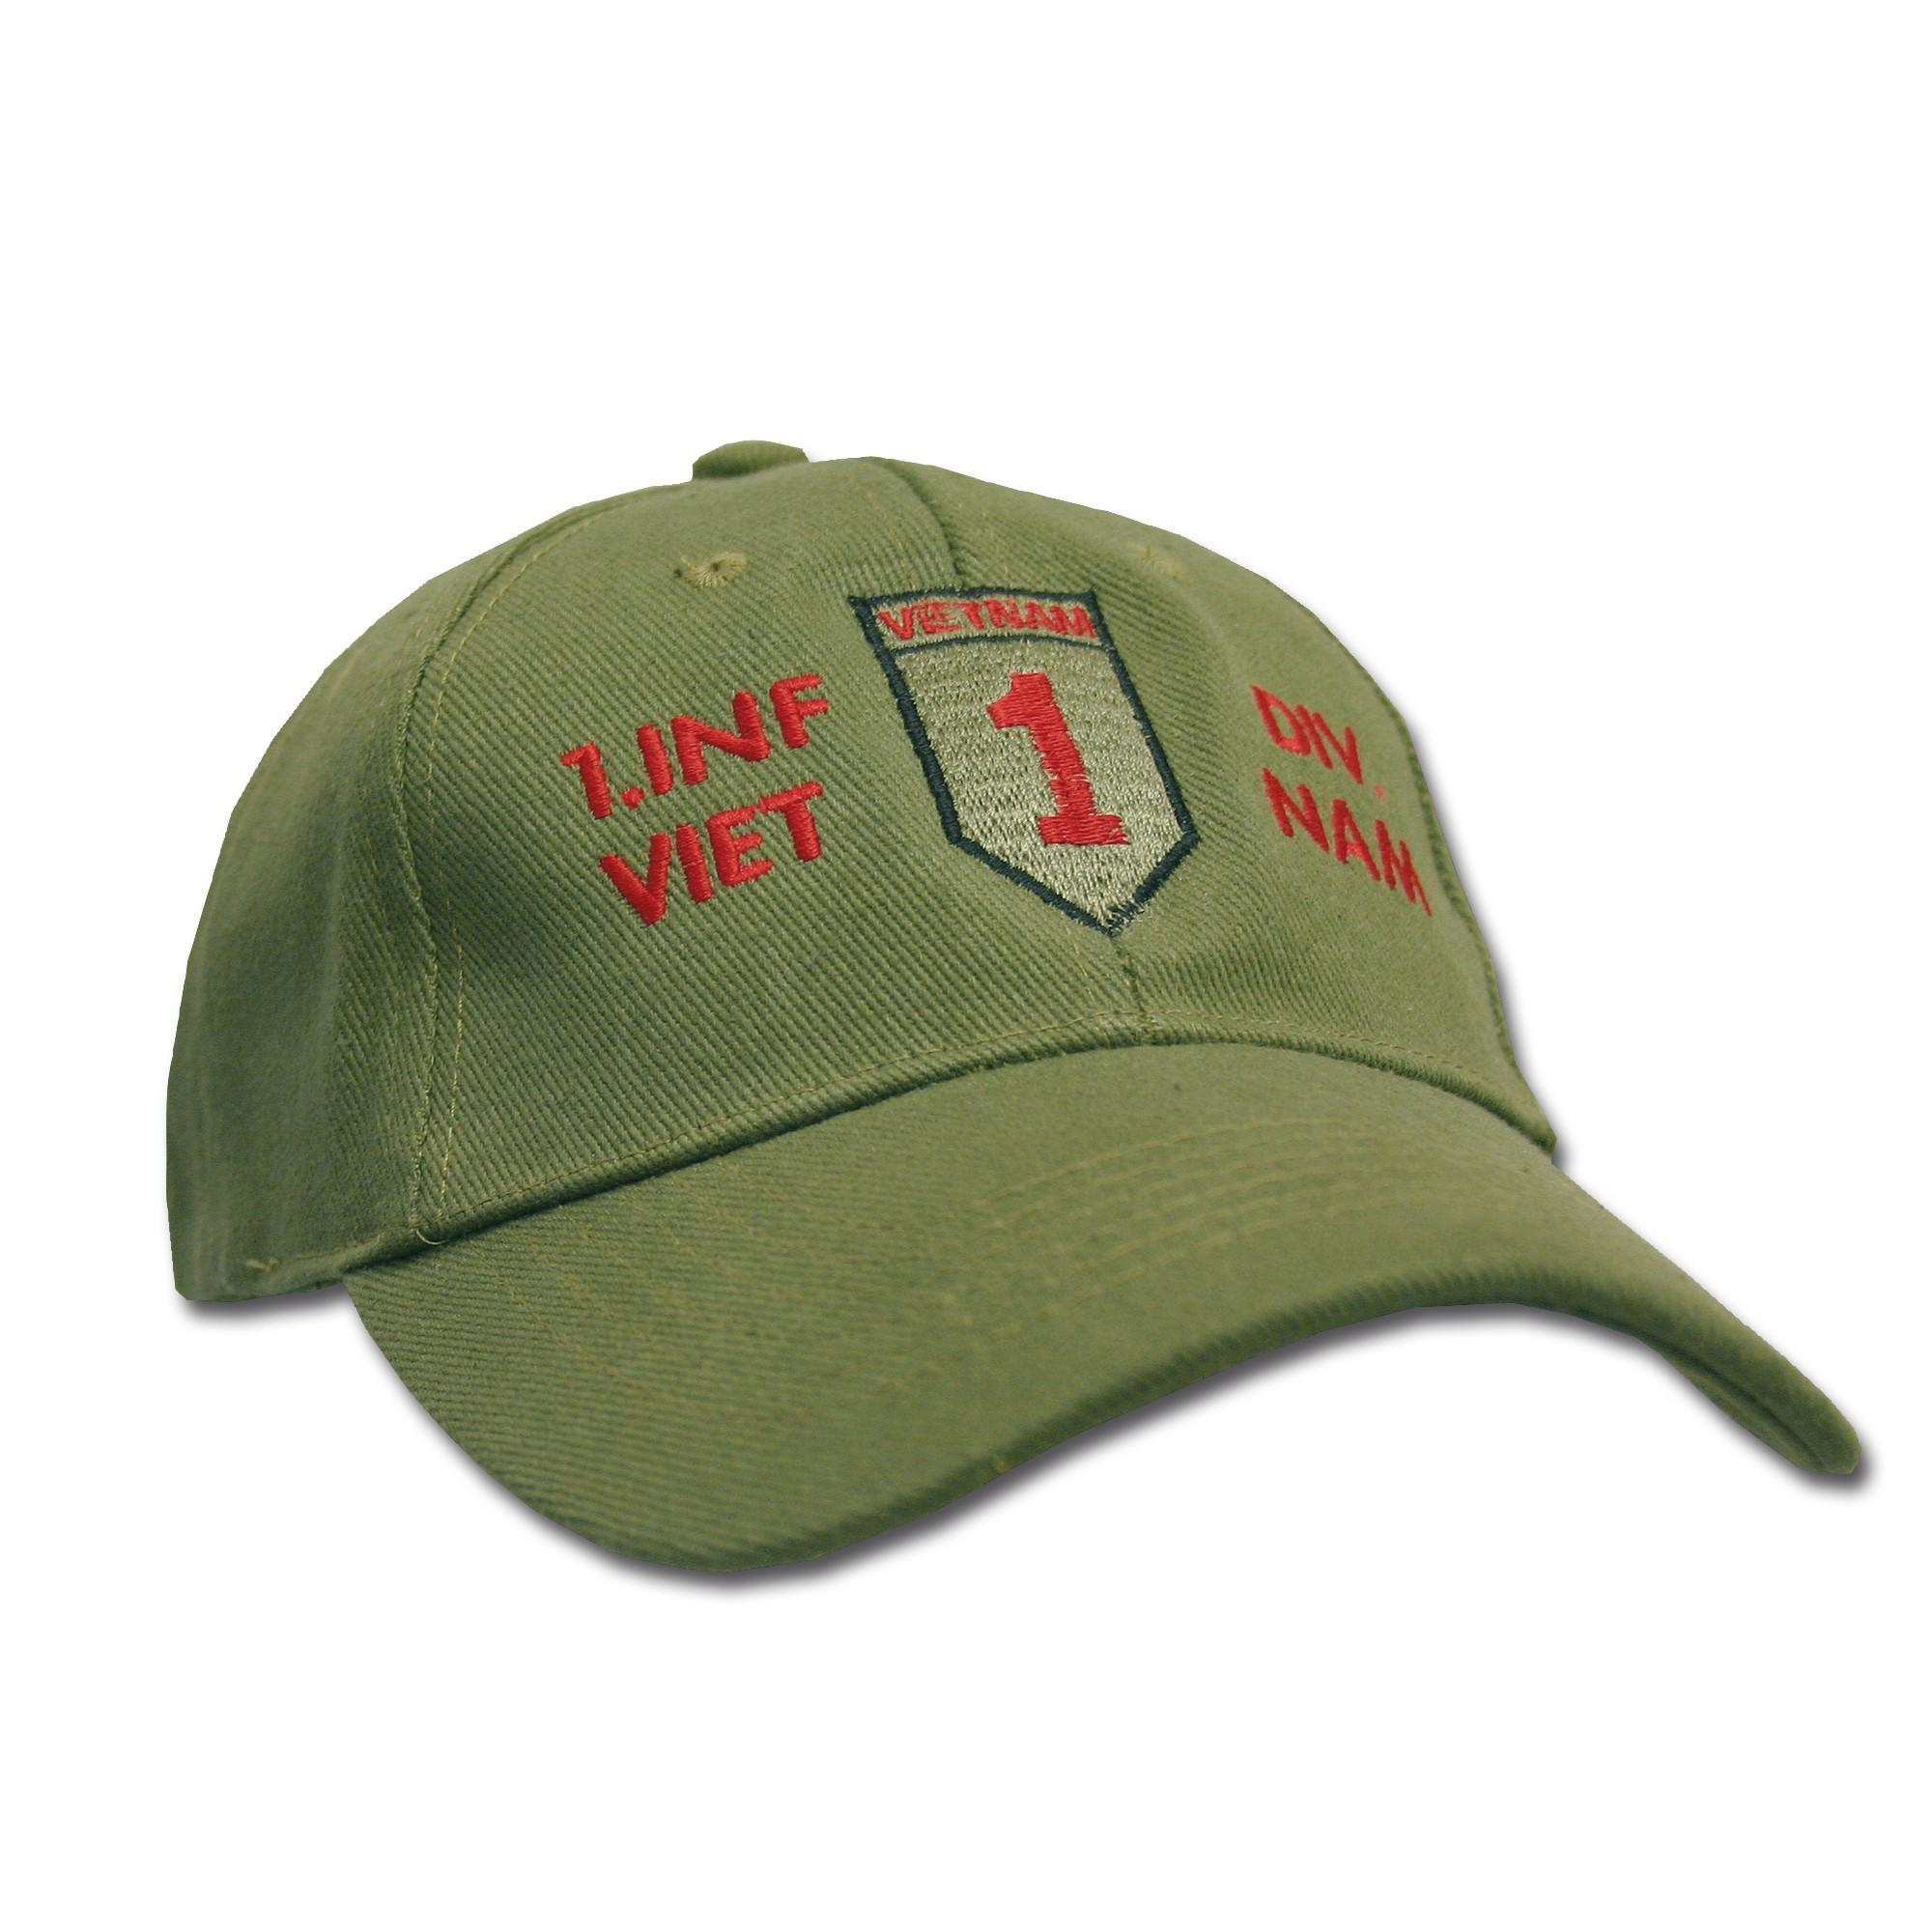 Baseball Cap 1.Inf.Div. Vietnam